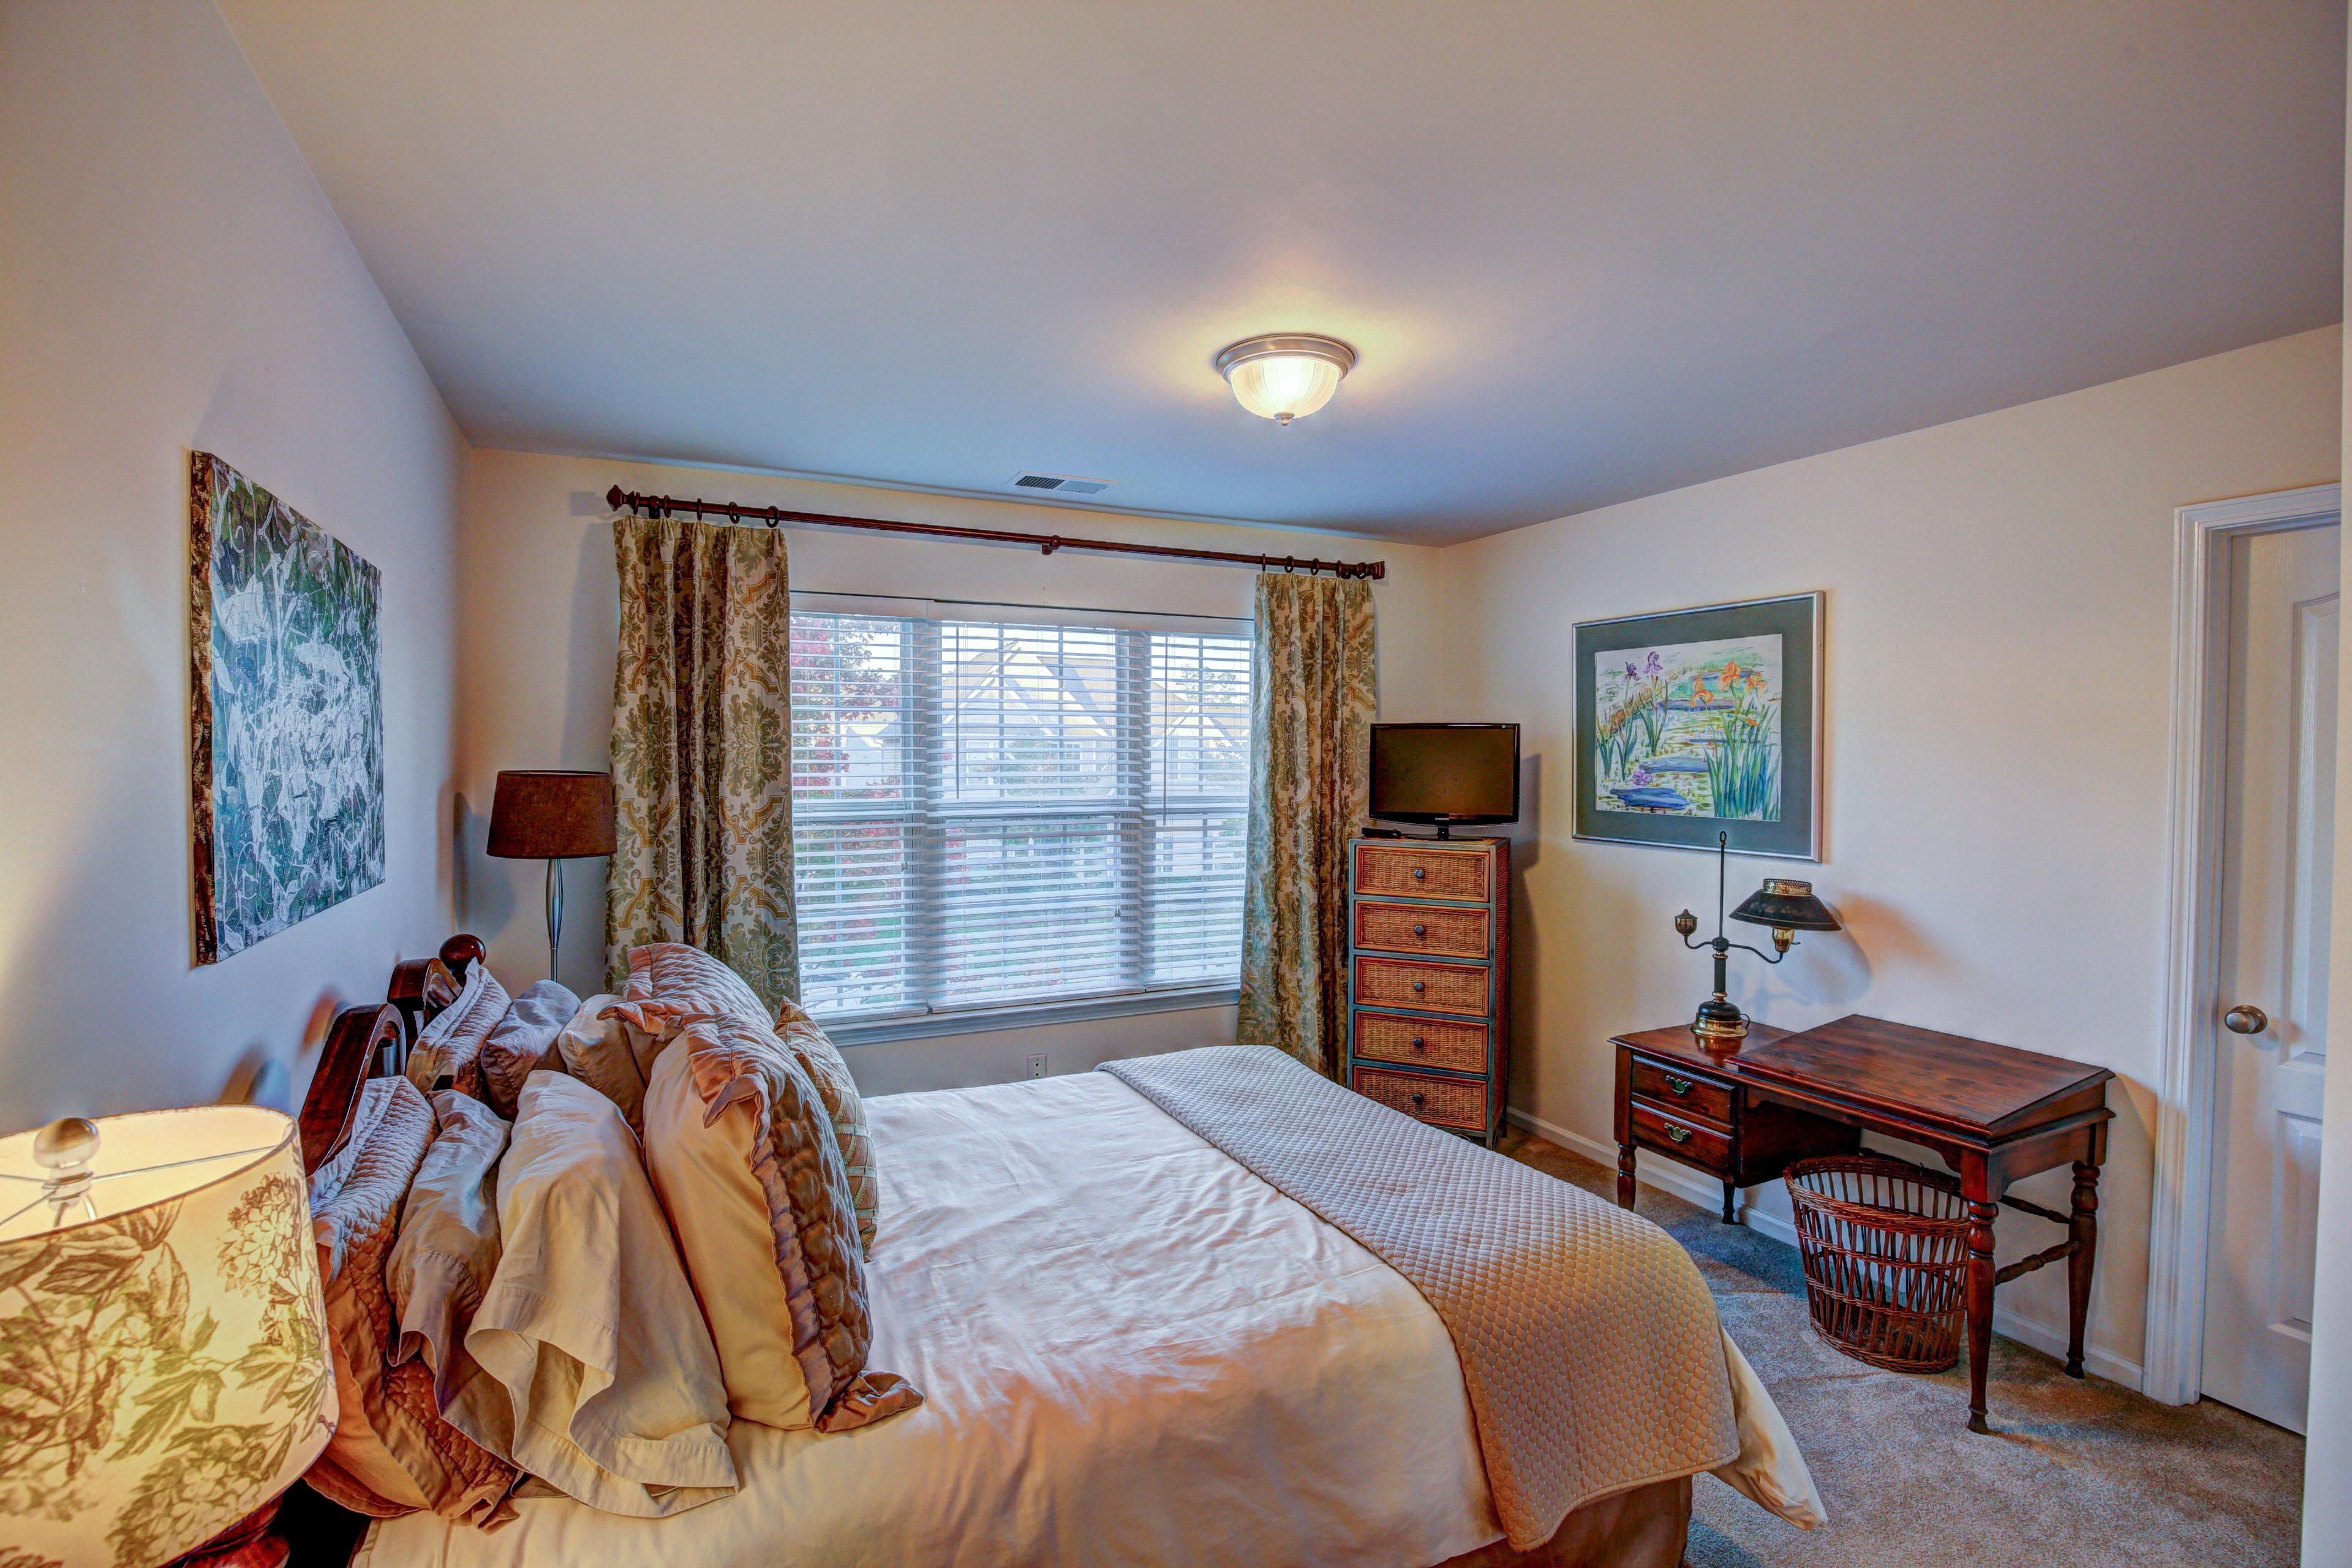 Edgewater-bedroom 2 (1)